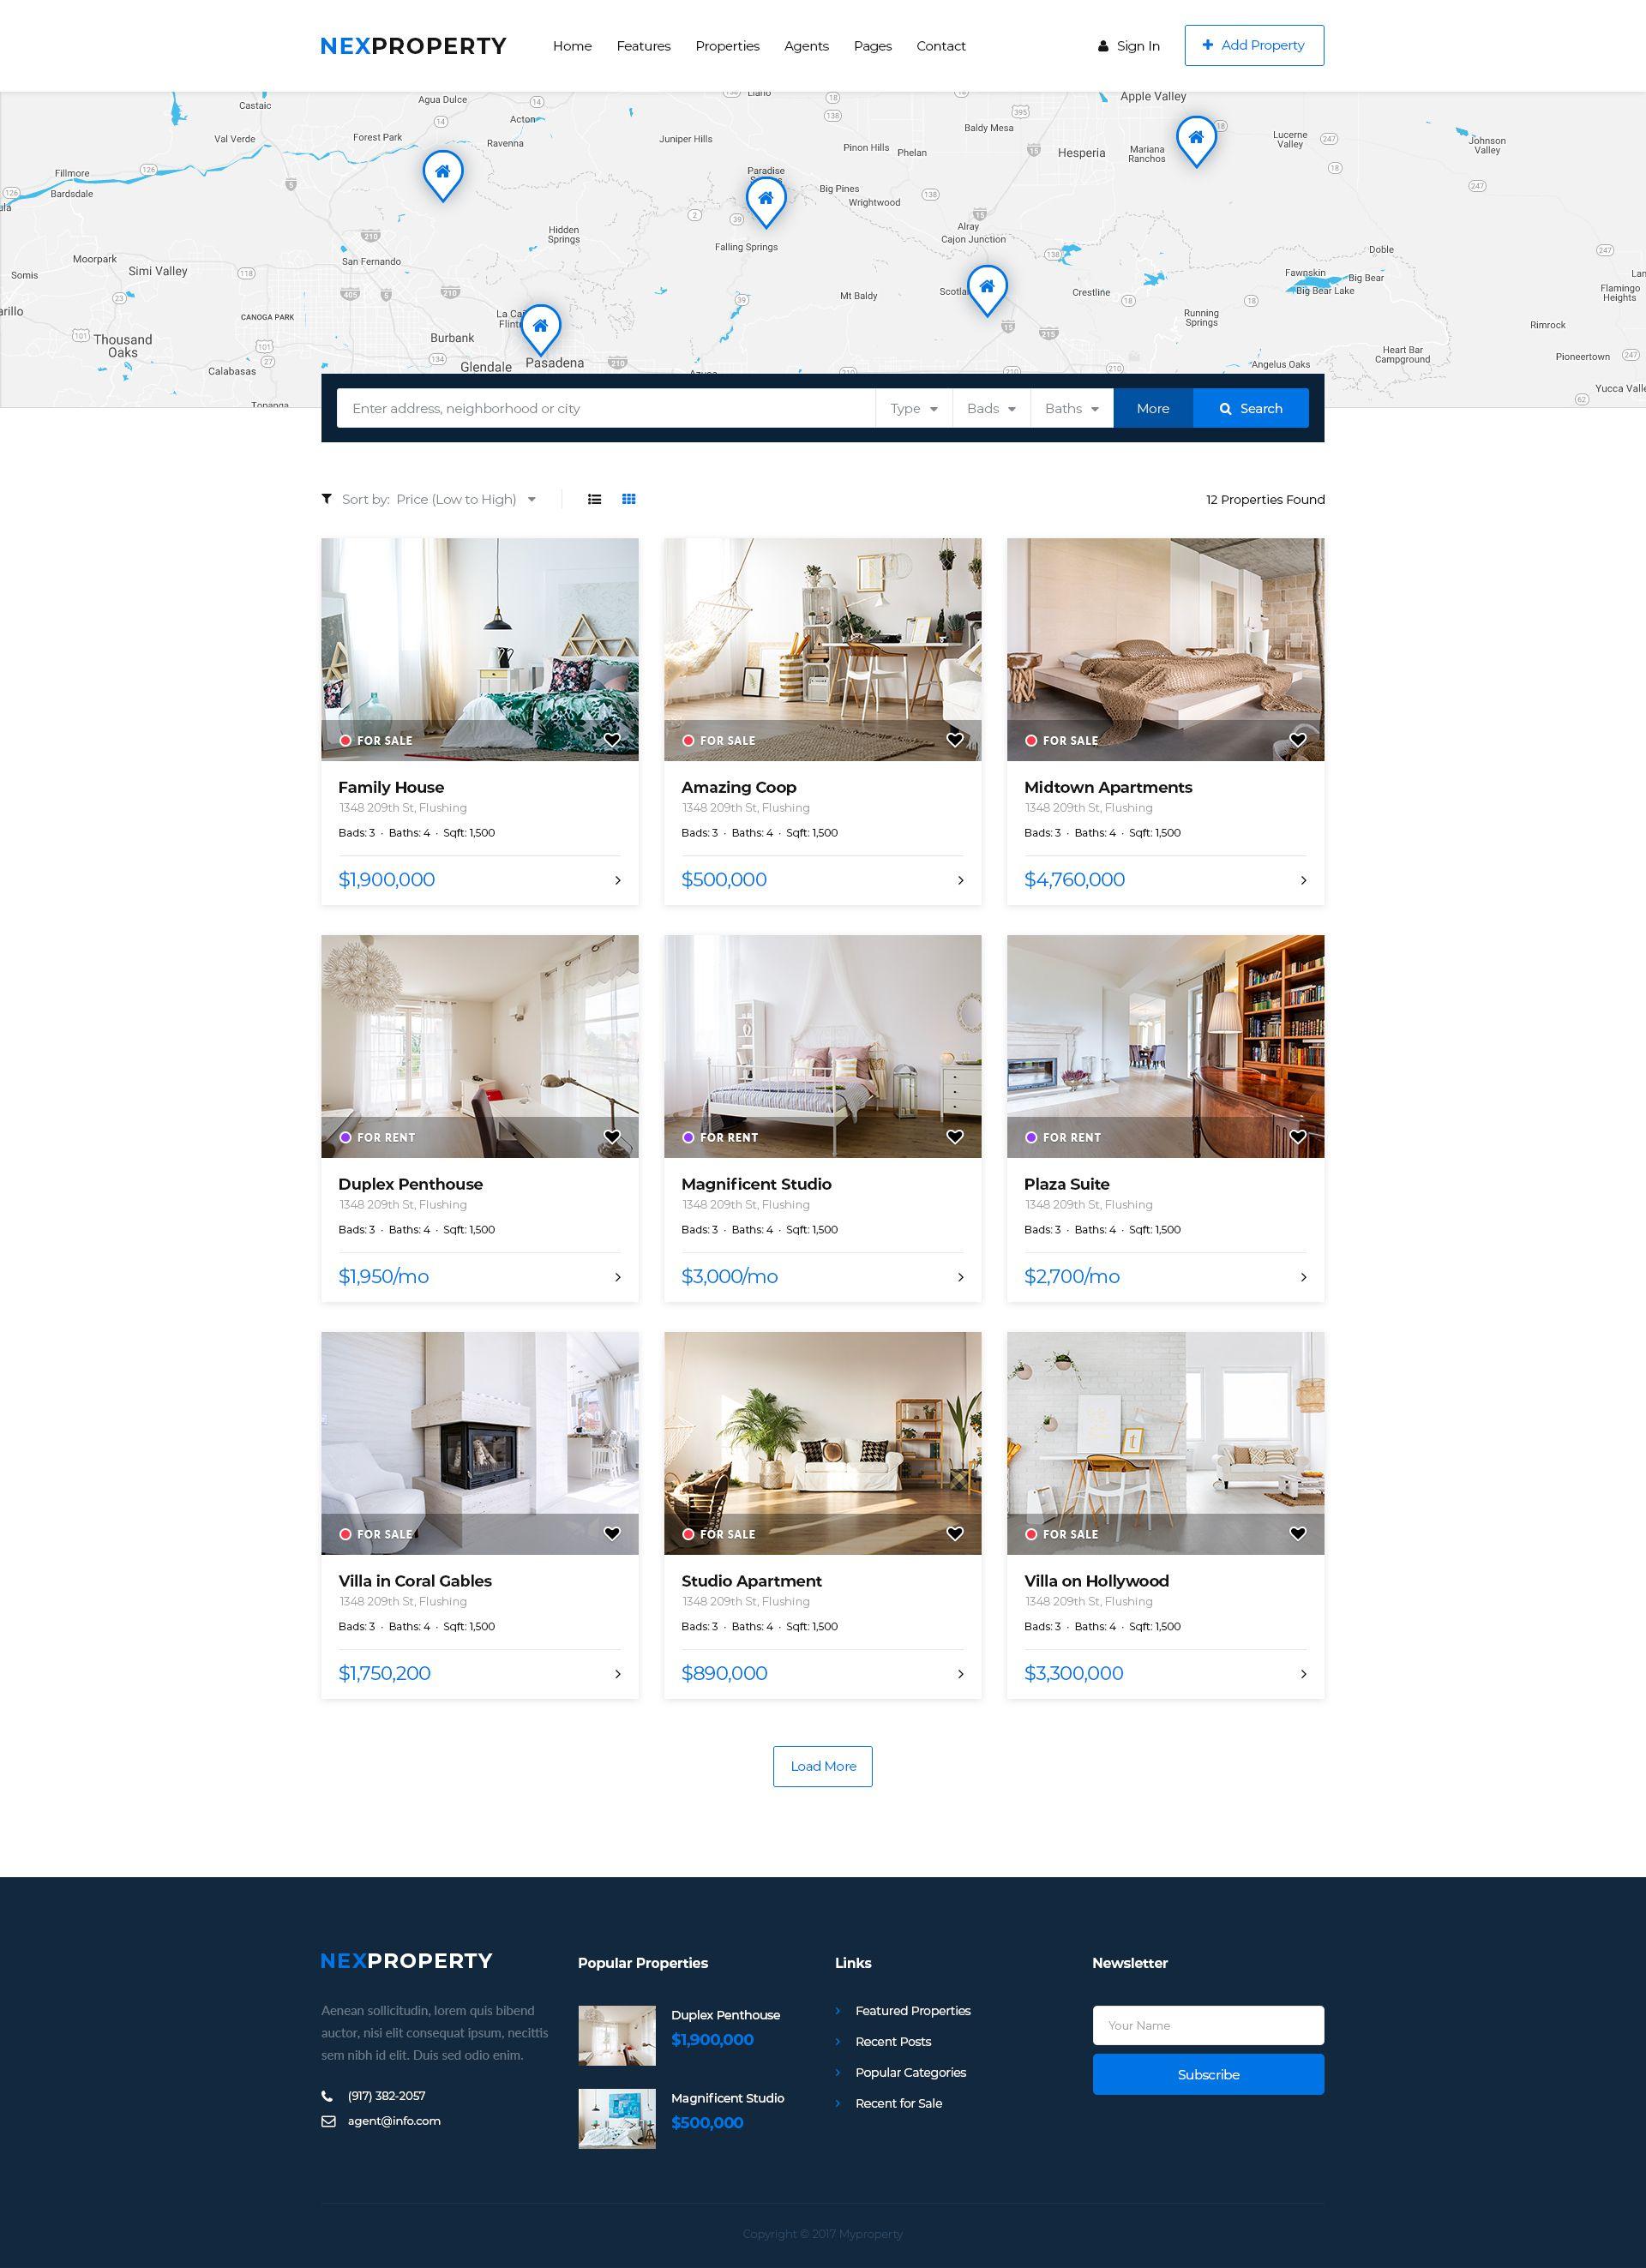 Real Estate Agency Nexproperty Estate Real Nexproperty